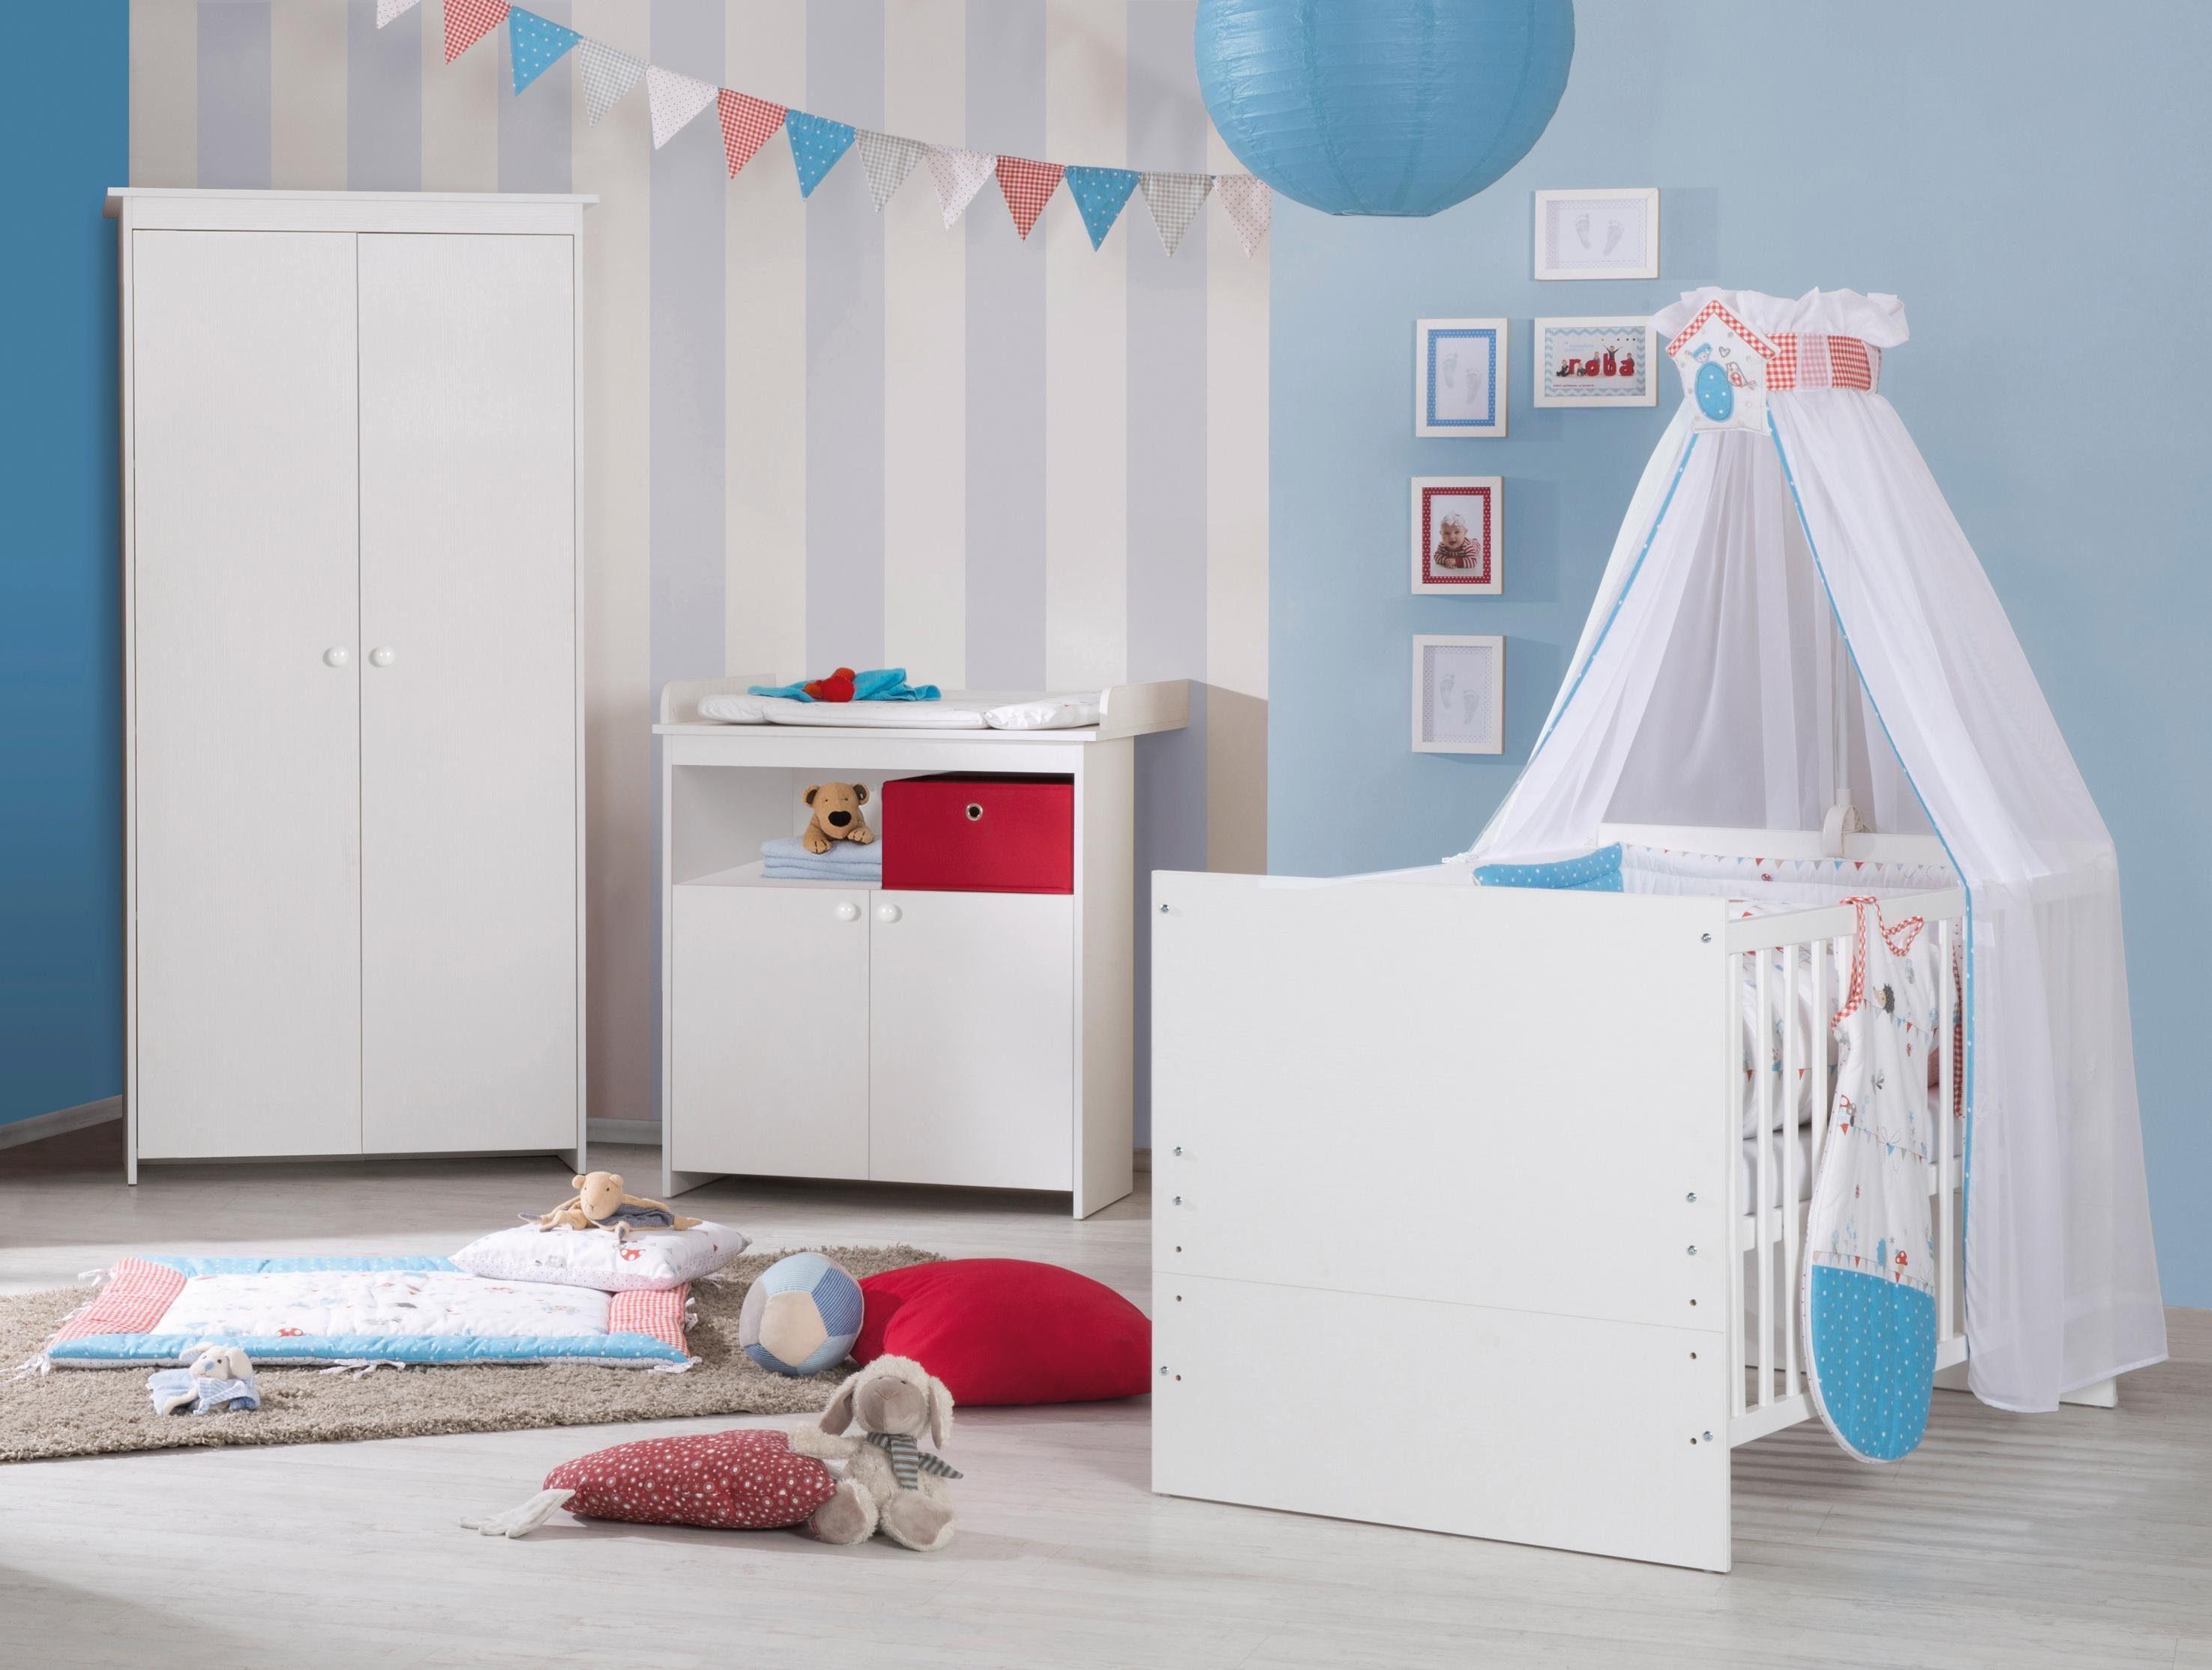 Roba Babyzimmer Set (3-tlg.), Kinderzimmer, »Emilia«